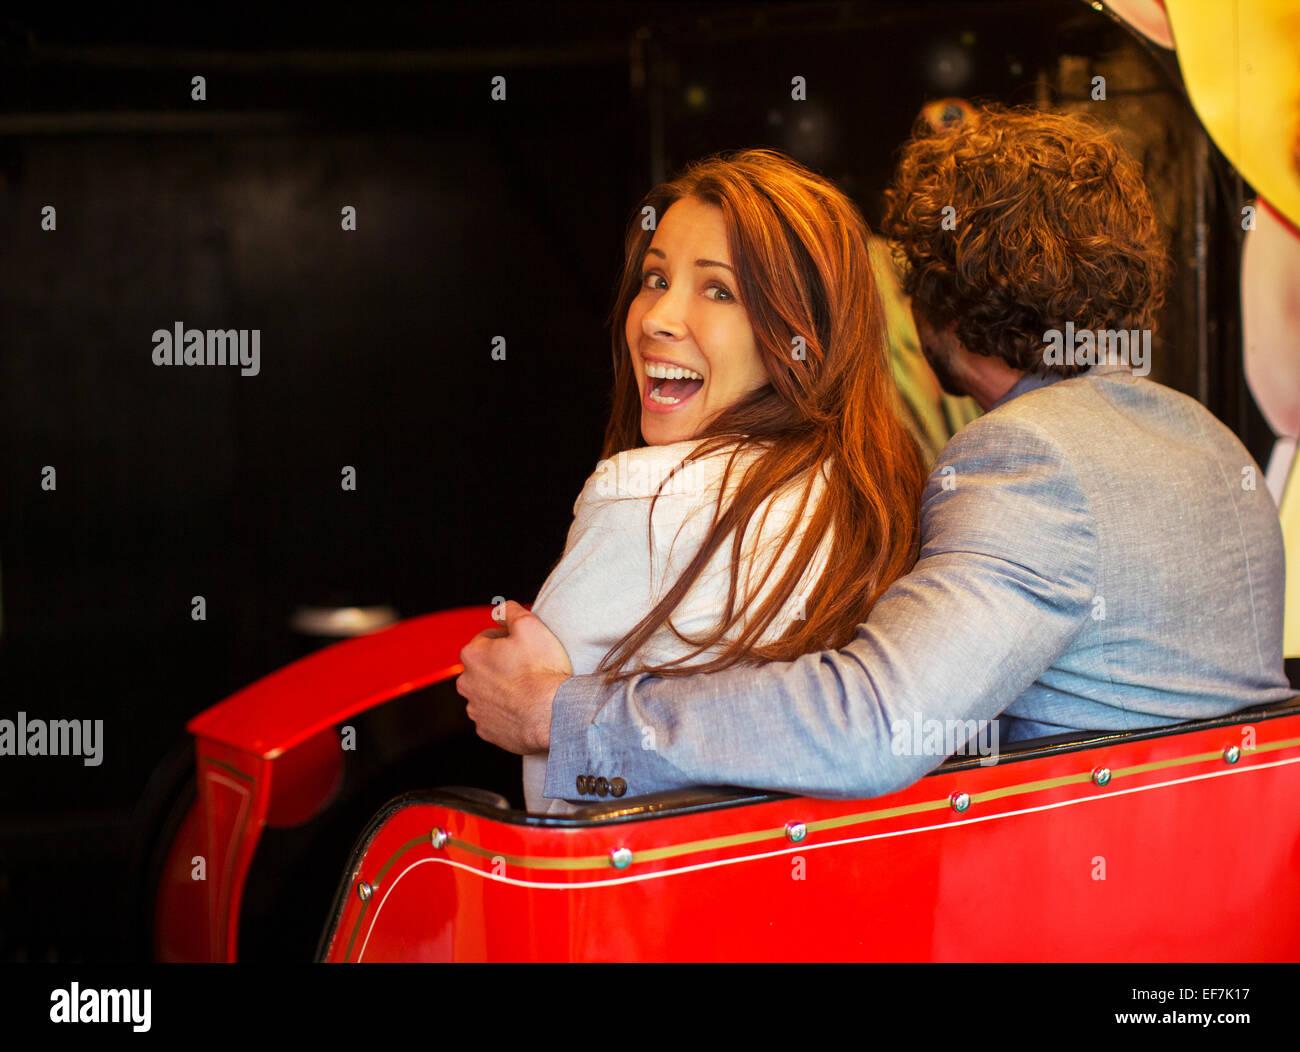 Mann umarmt Angst Freundin beim gehen in Tunnel Geisterbahn Stockbild